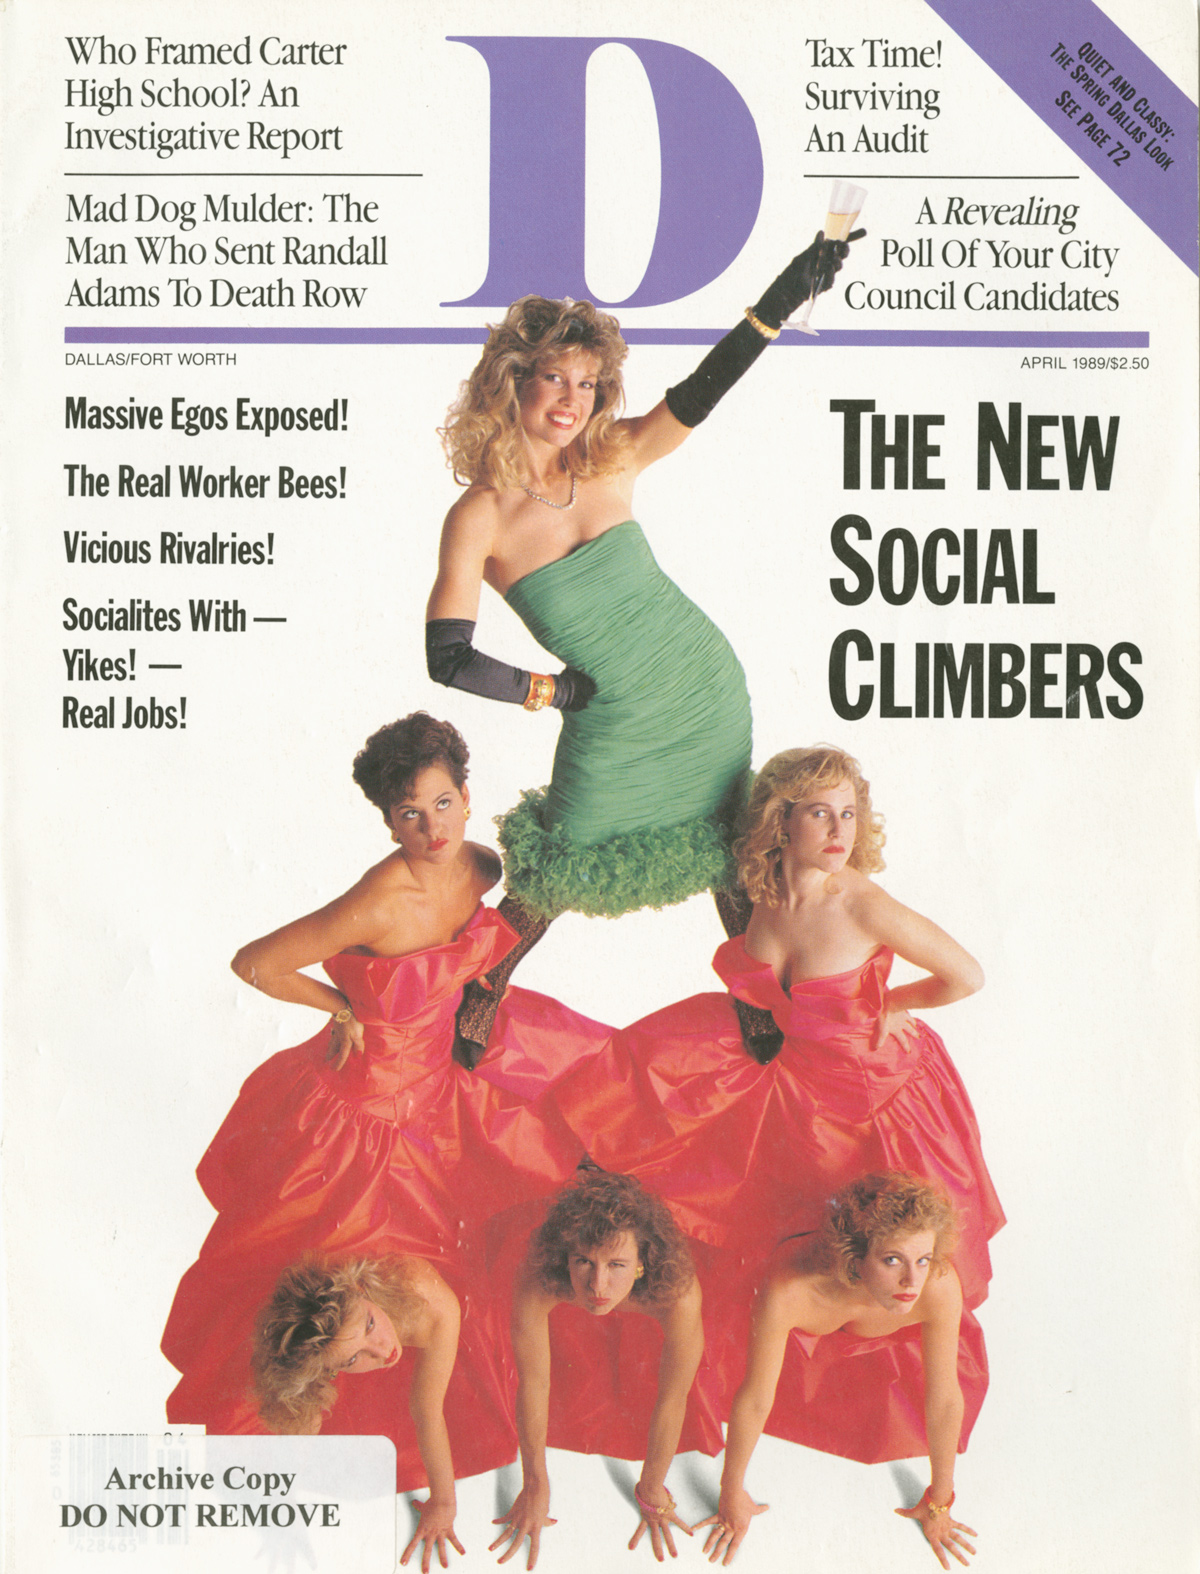 April 1989 cover